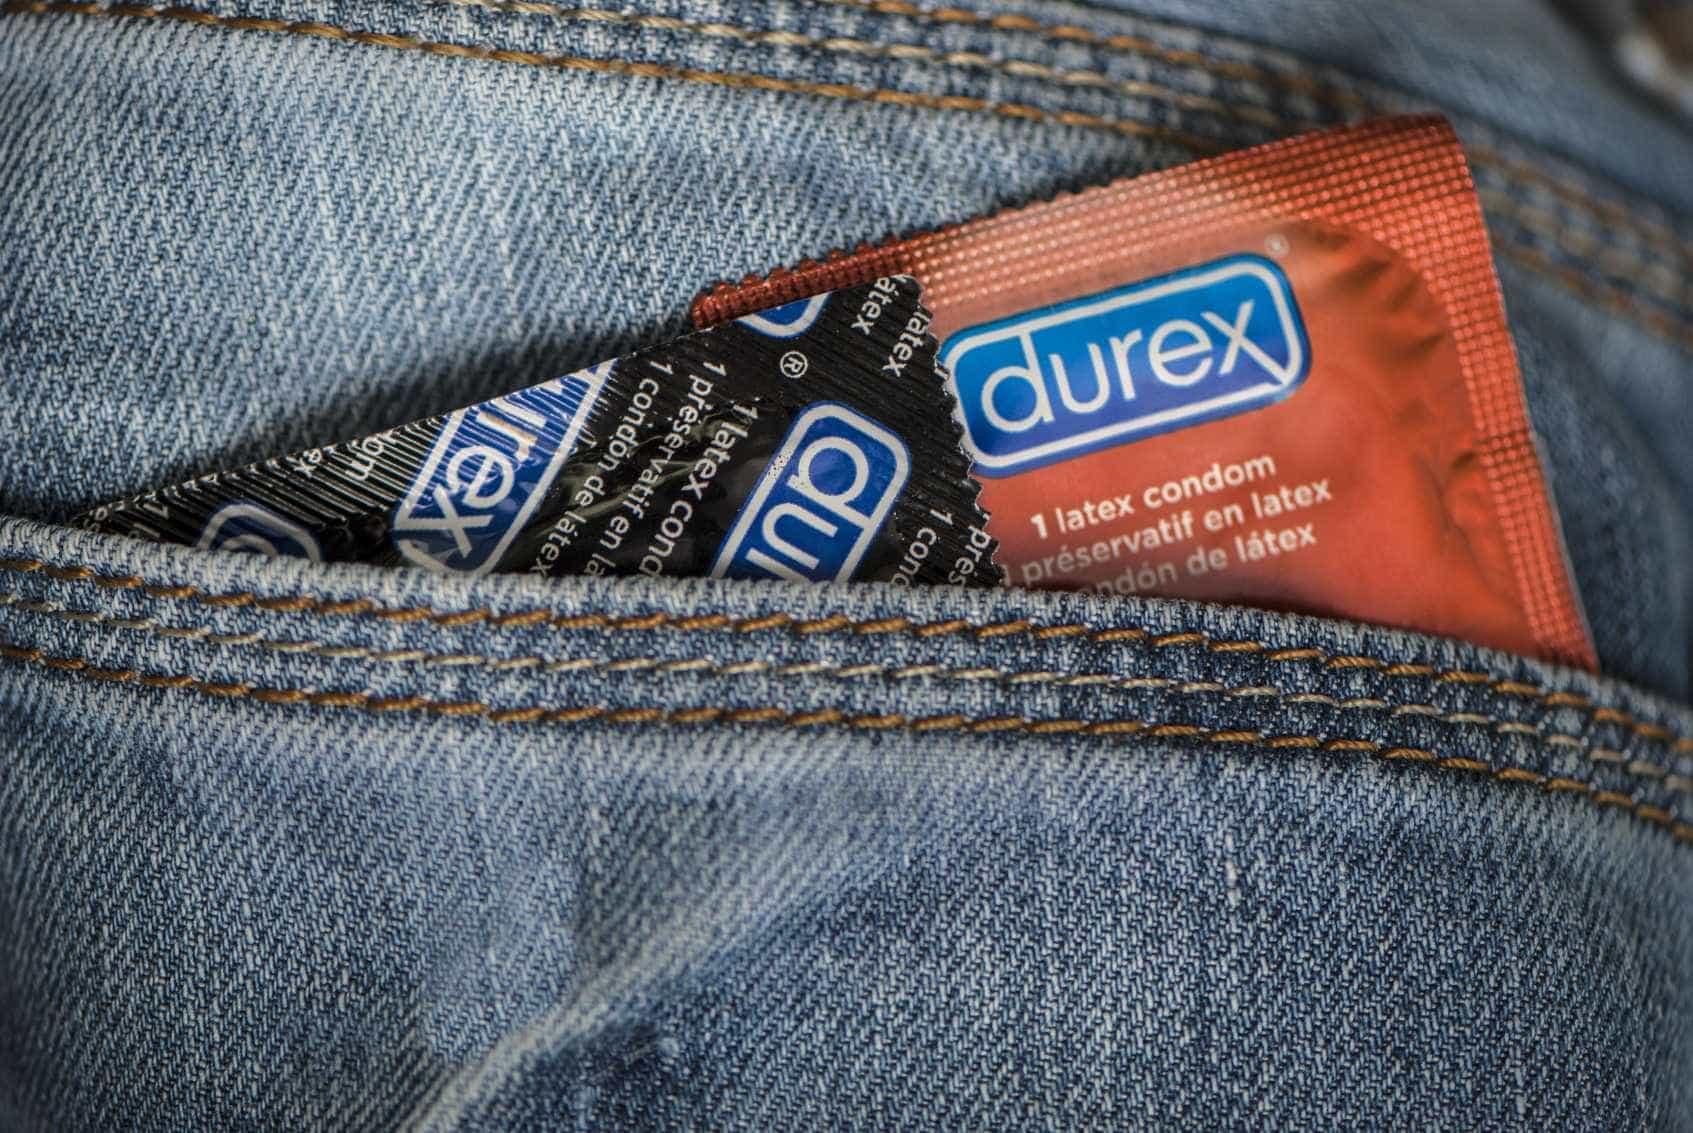 Durex retira do mercado embalagens cuja validade é duvidosa